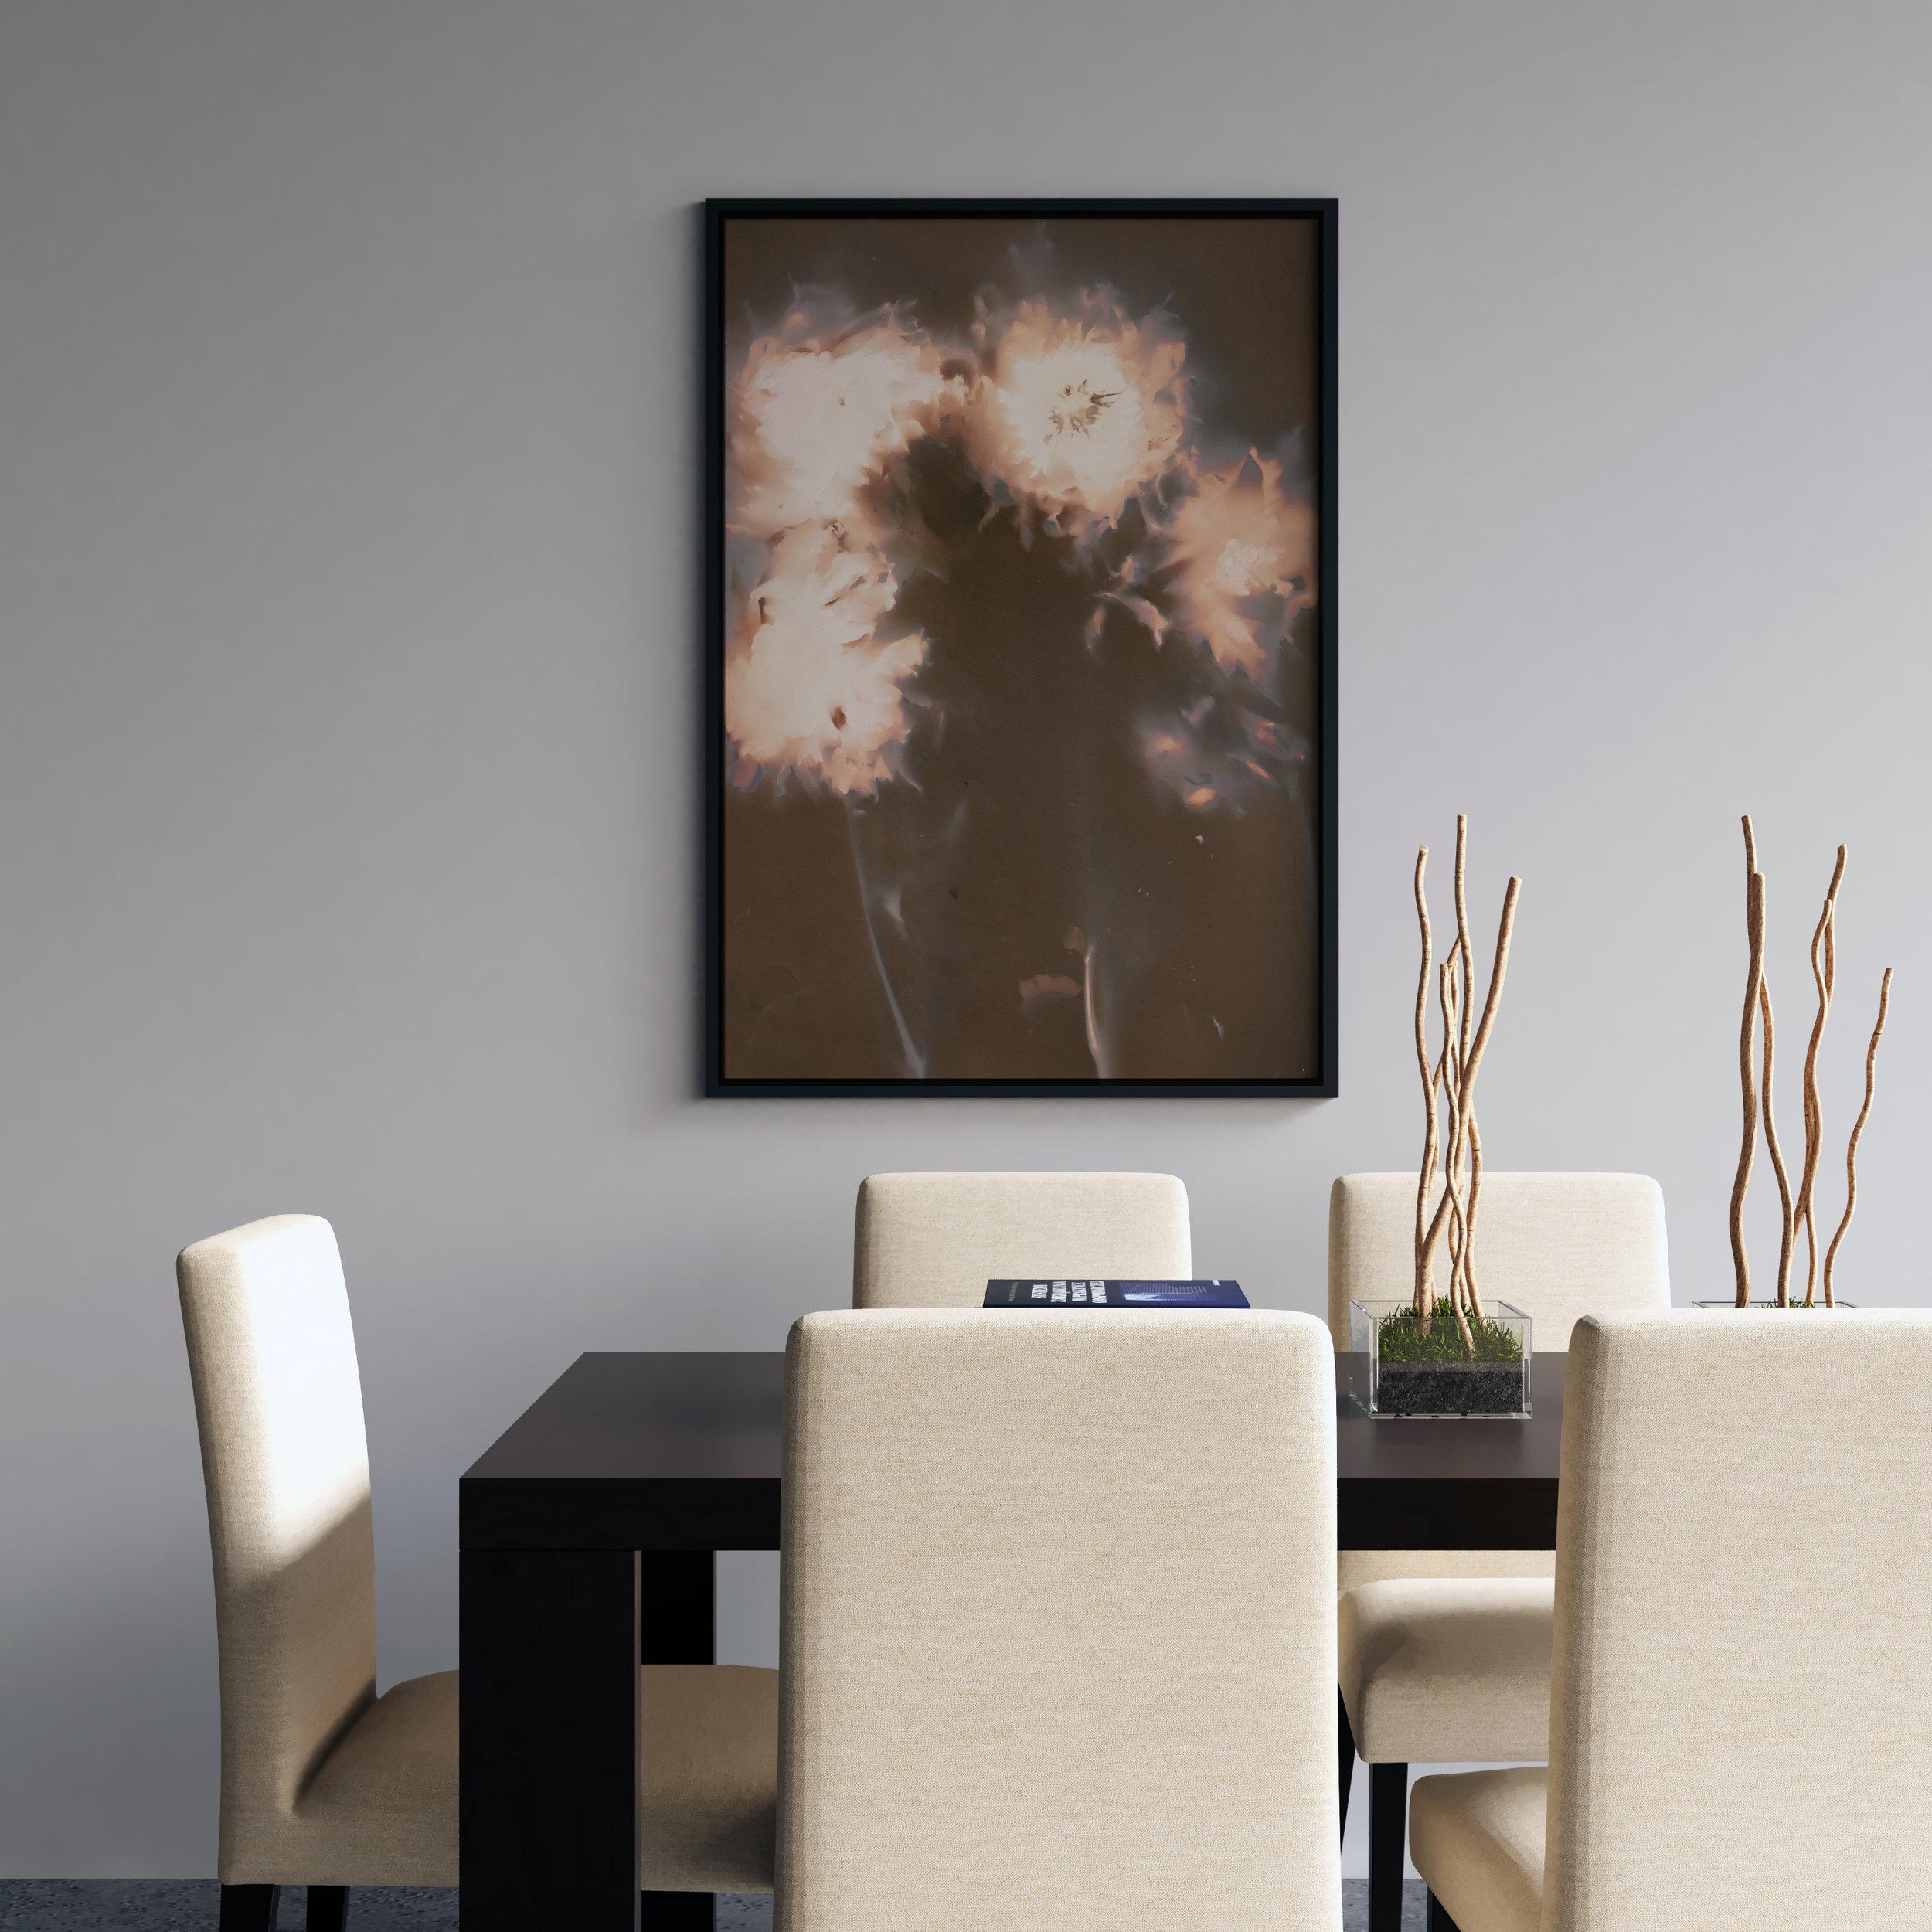 'Explosion' botanical lumen print by Krista McCurdy